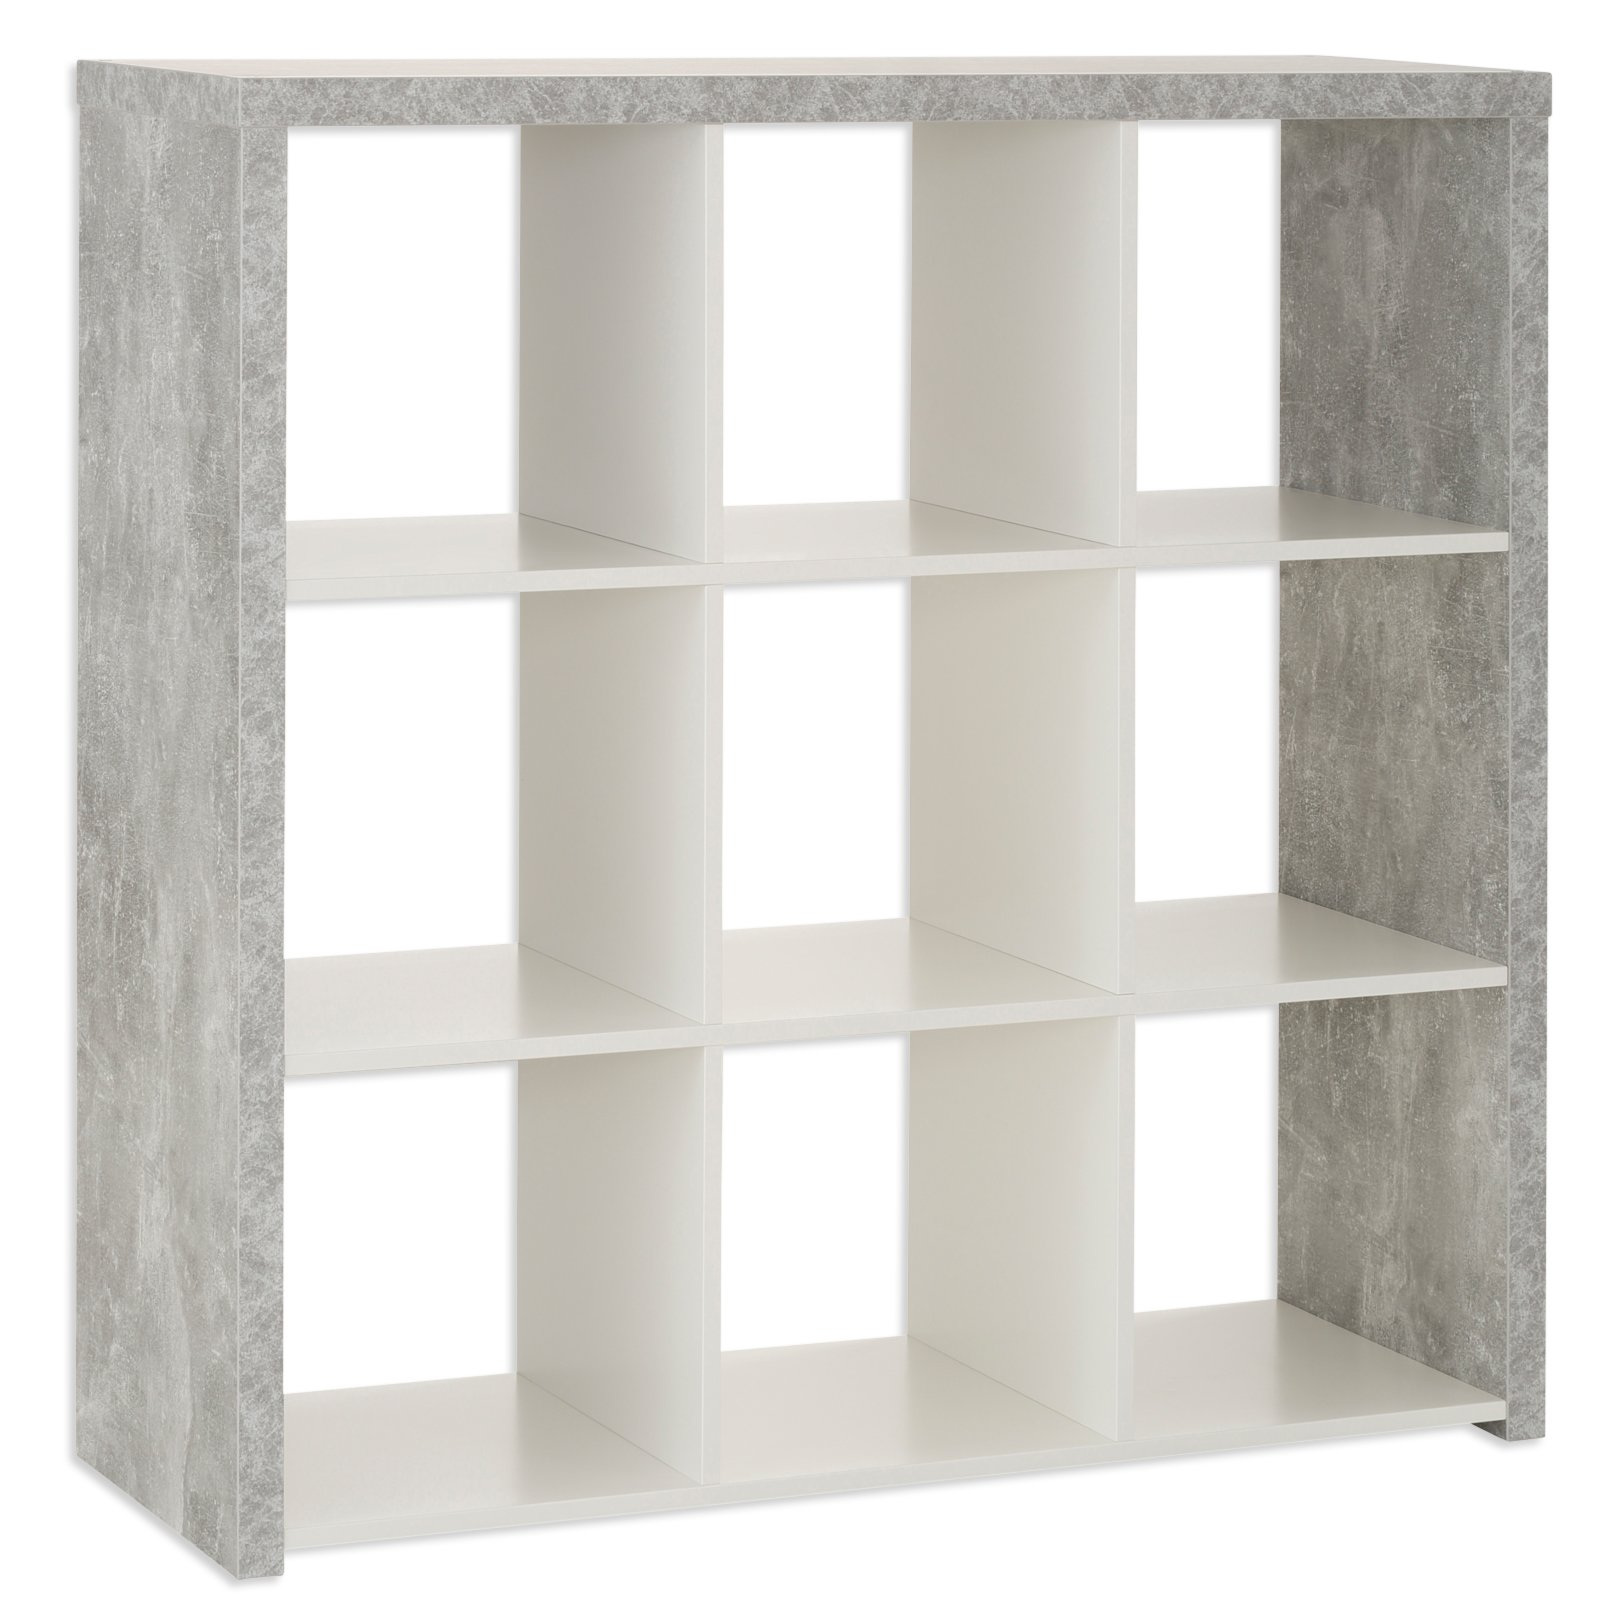 regal marta - beton-weiß - 3x3 fächer | regalserie marta | regale